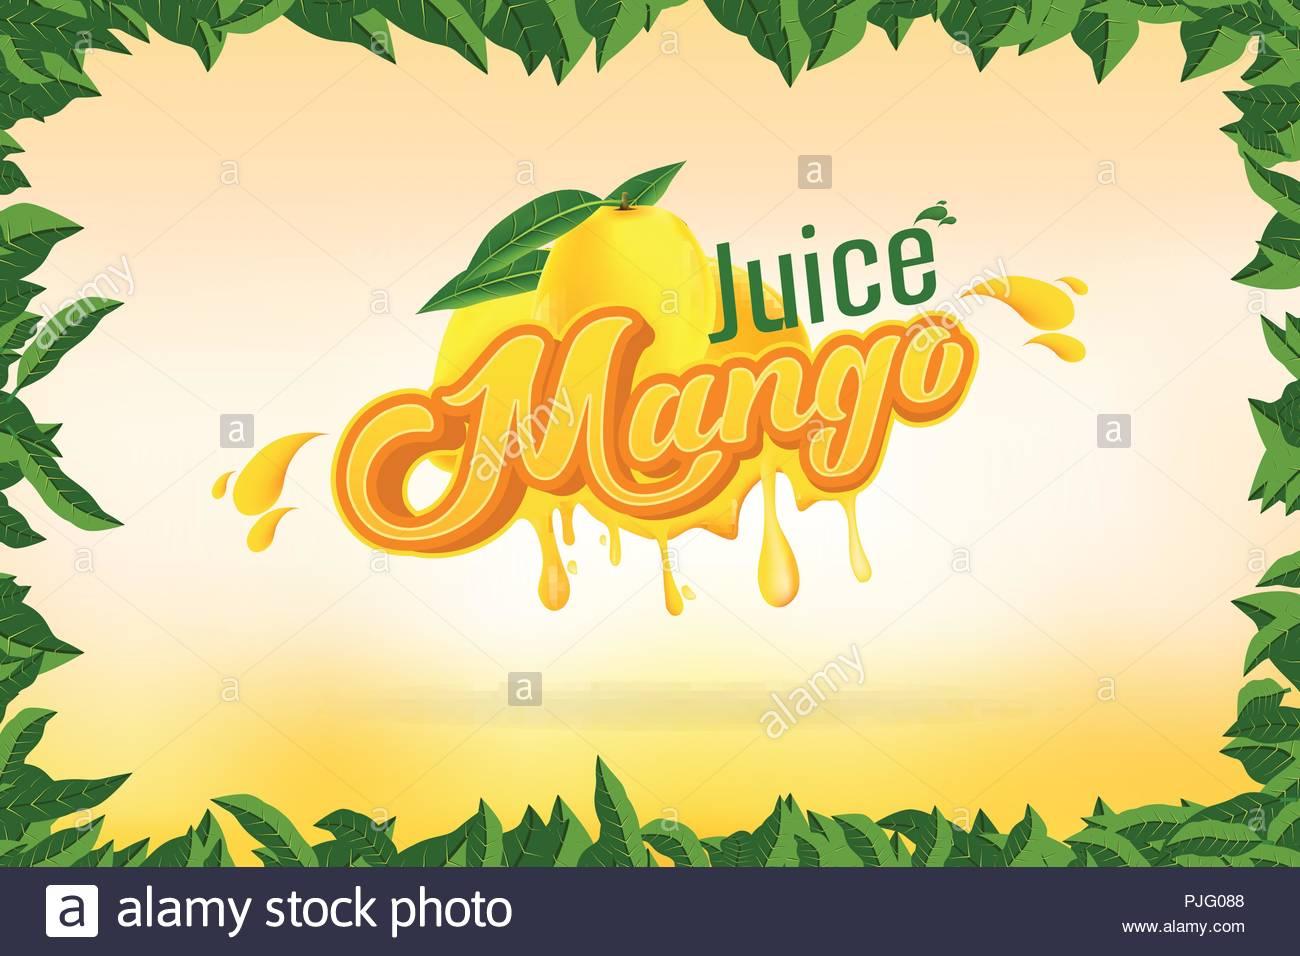 Mango Juice Brand Company Logo Design with background vector 1300x956